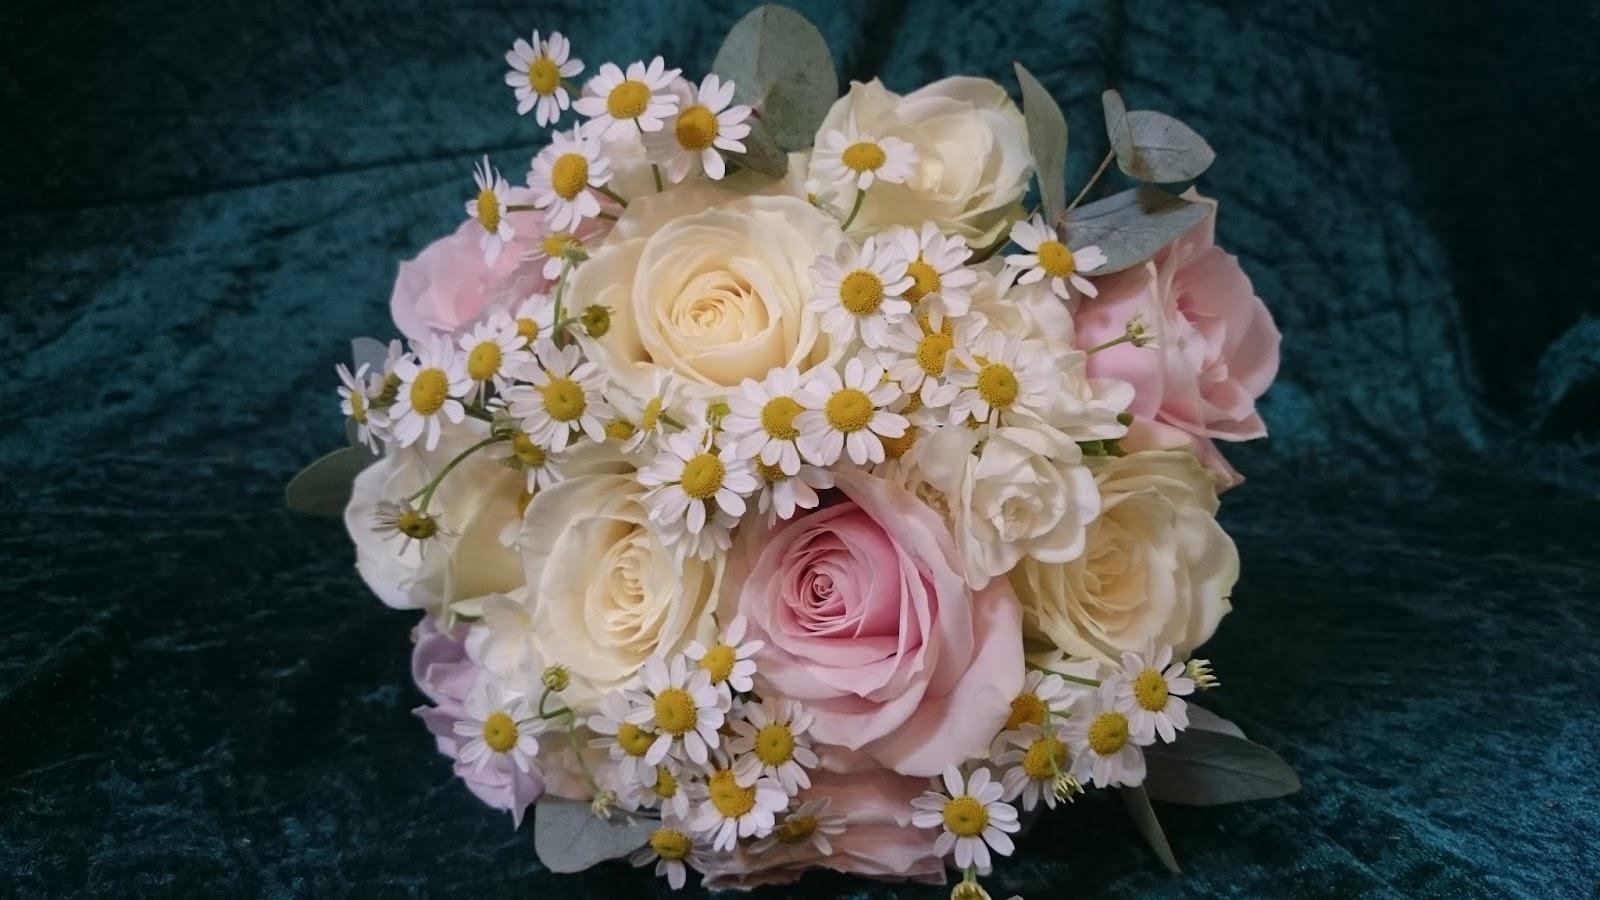 Sandras Flower Studio Peony Rose And Daisy Wedding Flowers